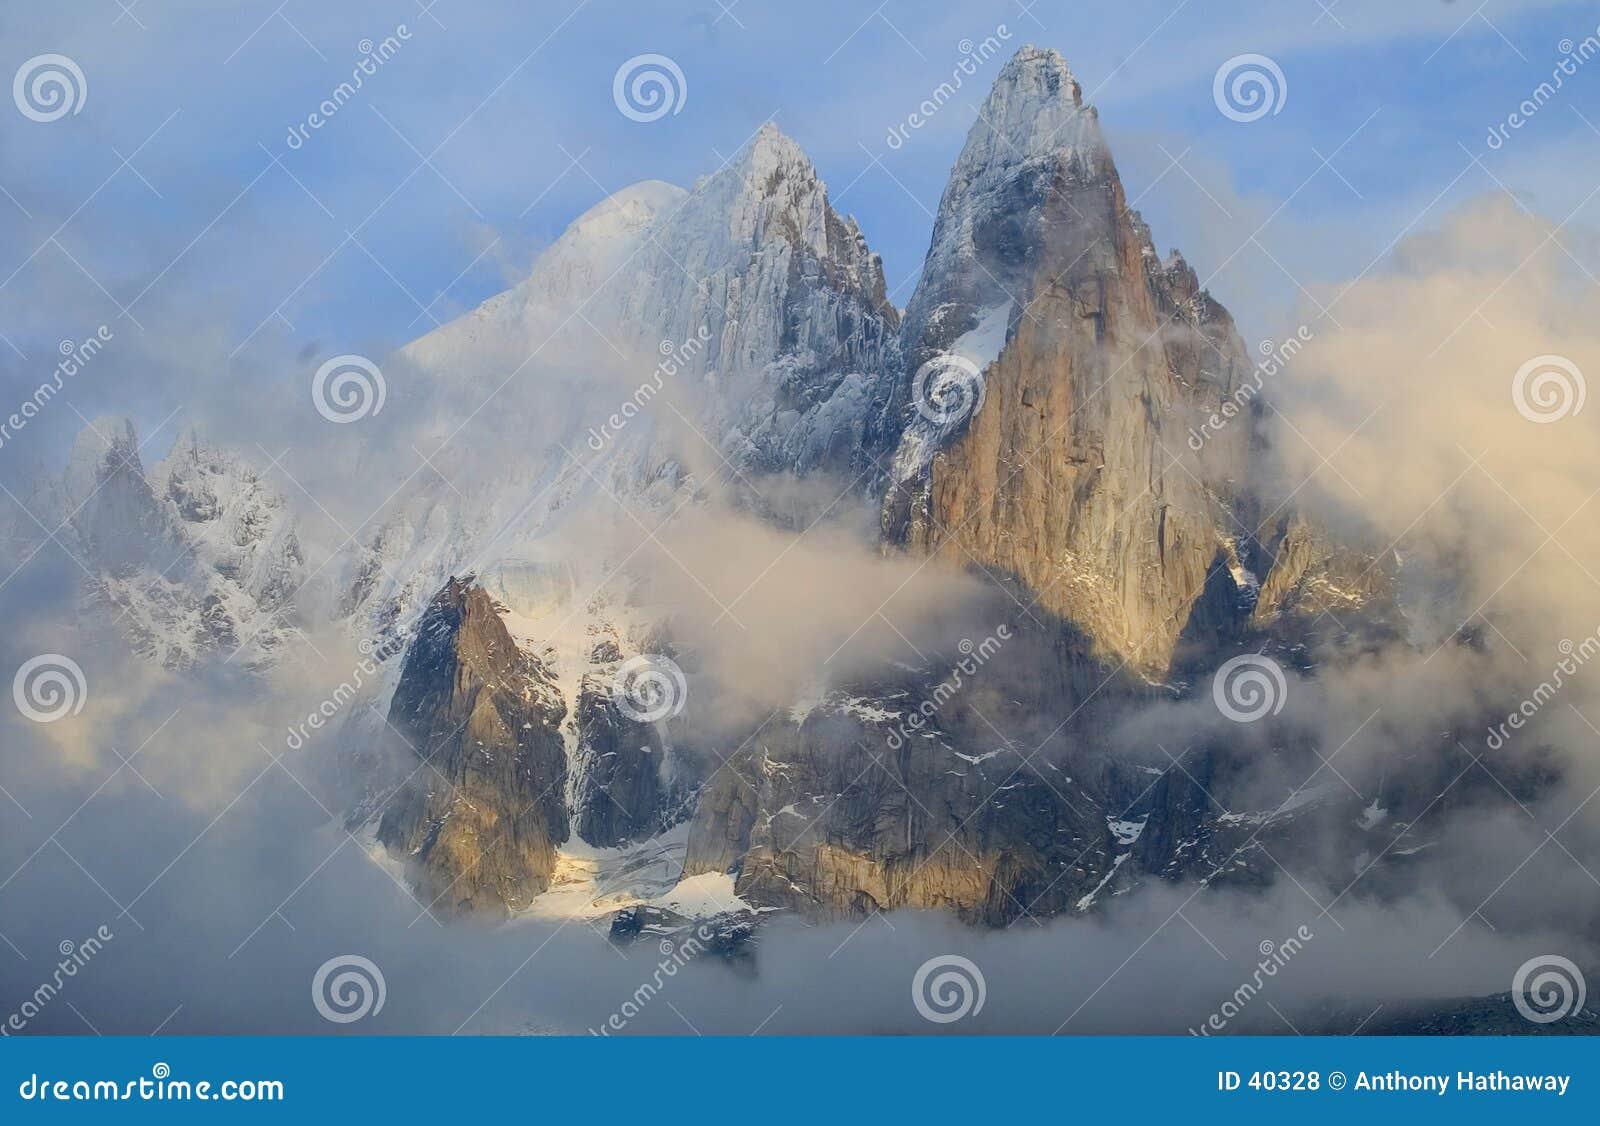 The Needles of Chamonix